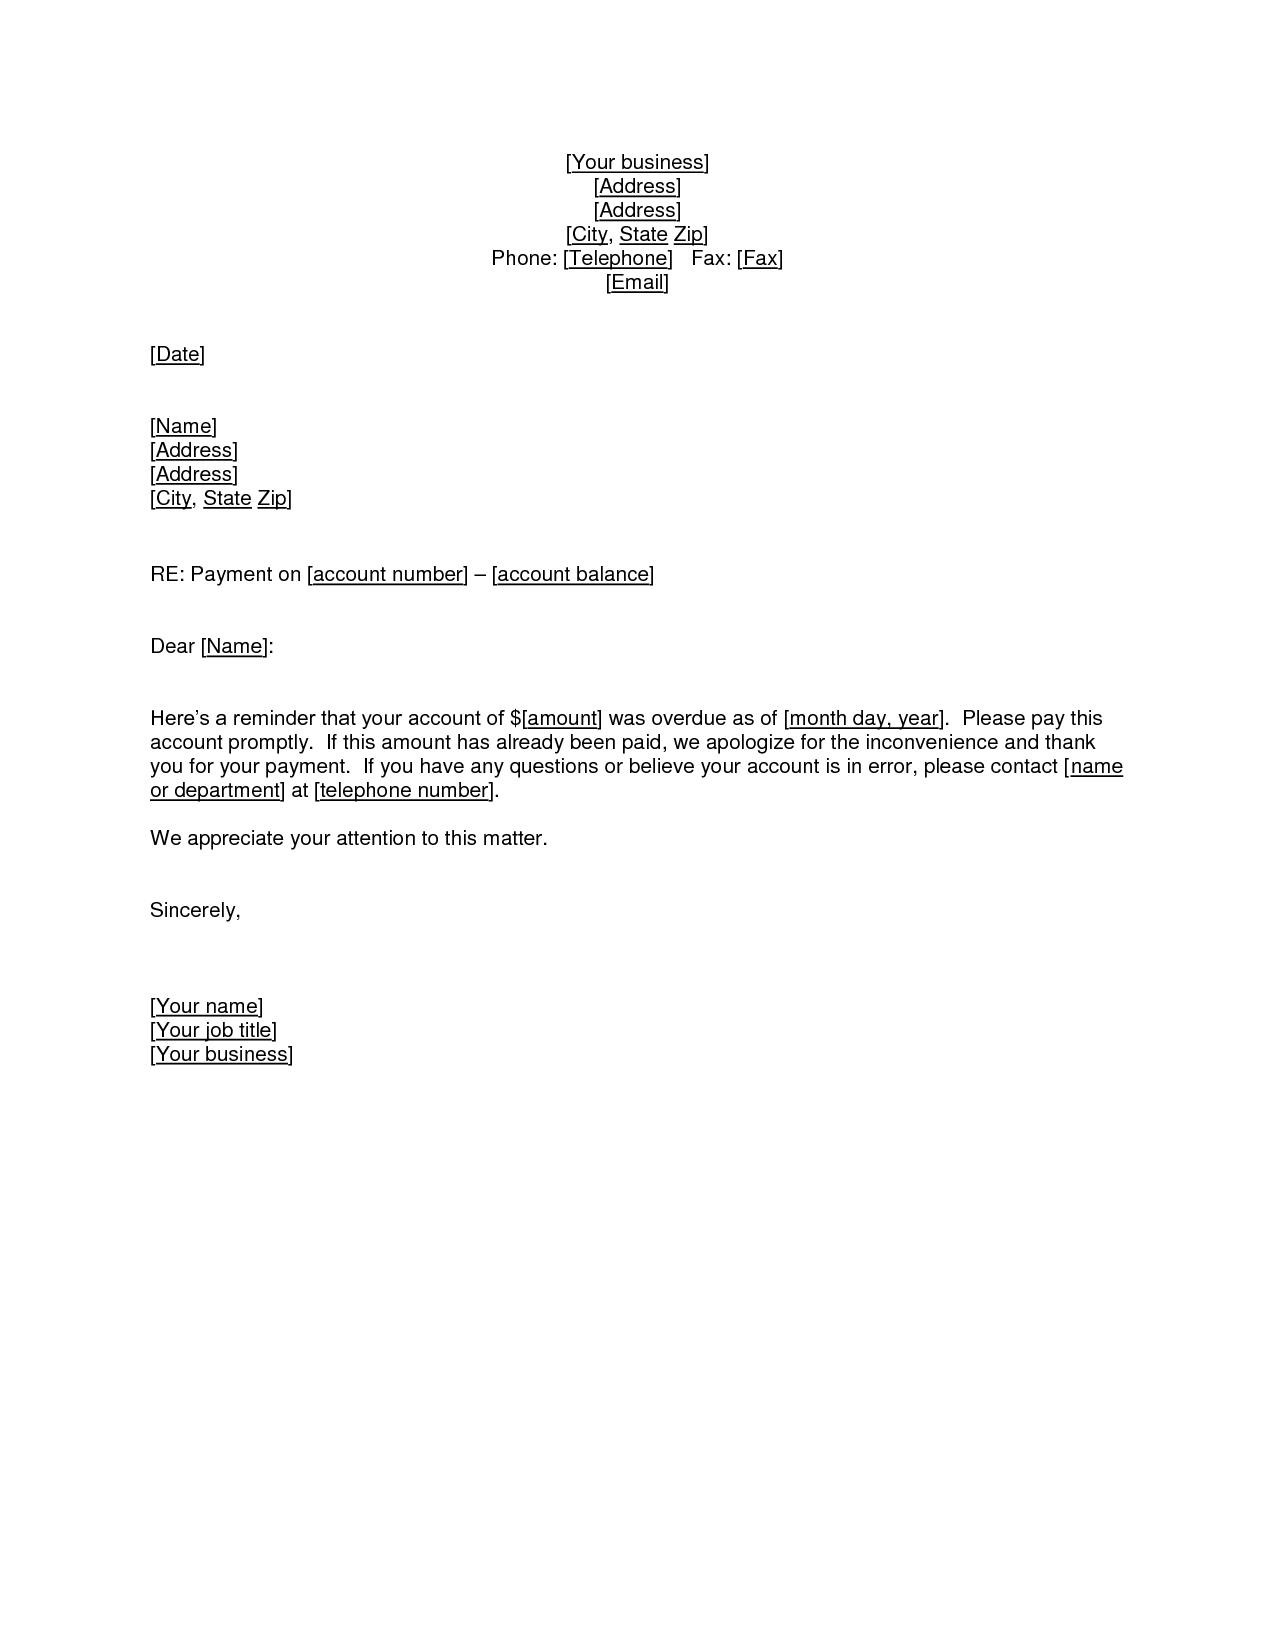 Debt Harassment Template Letter - New Debt Validation Letter Template